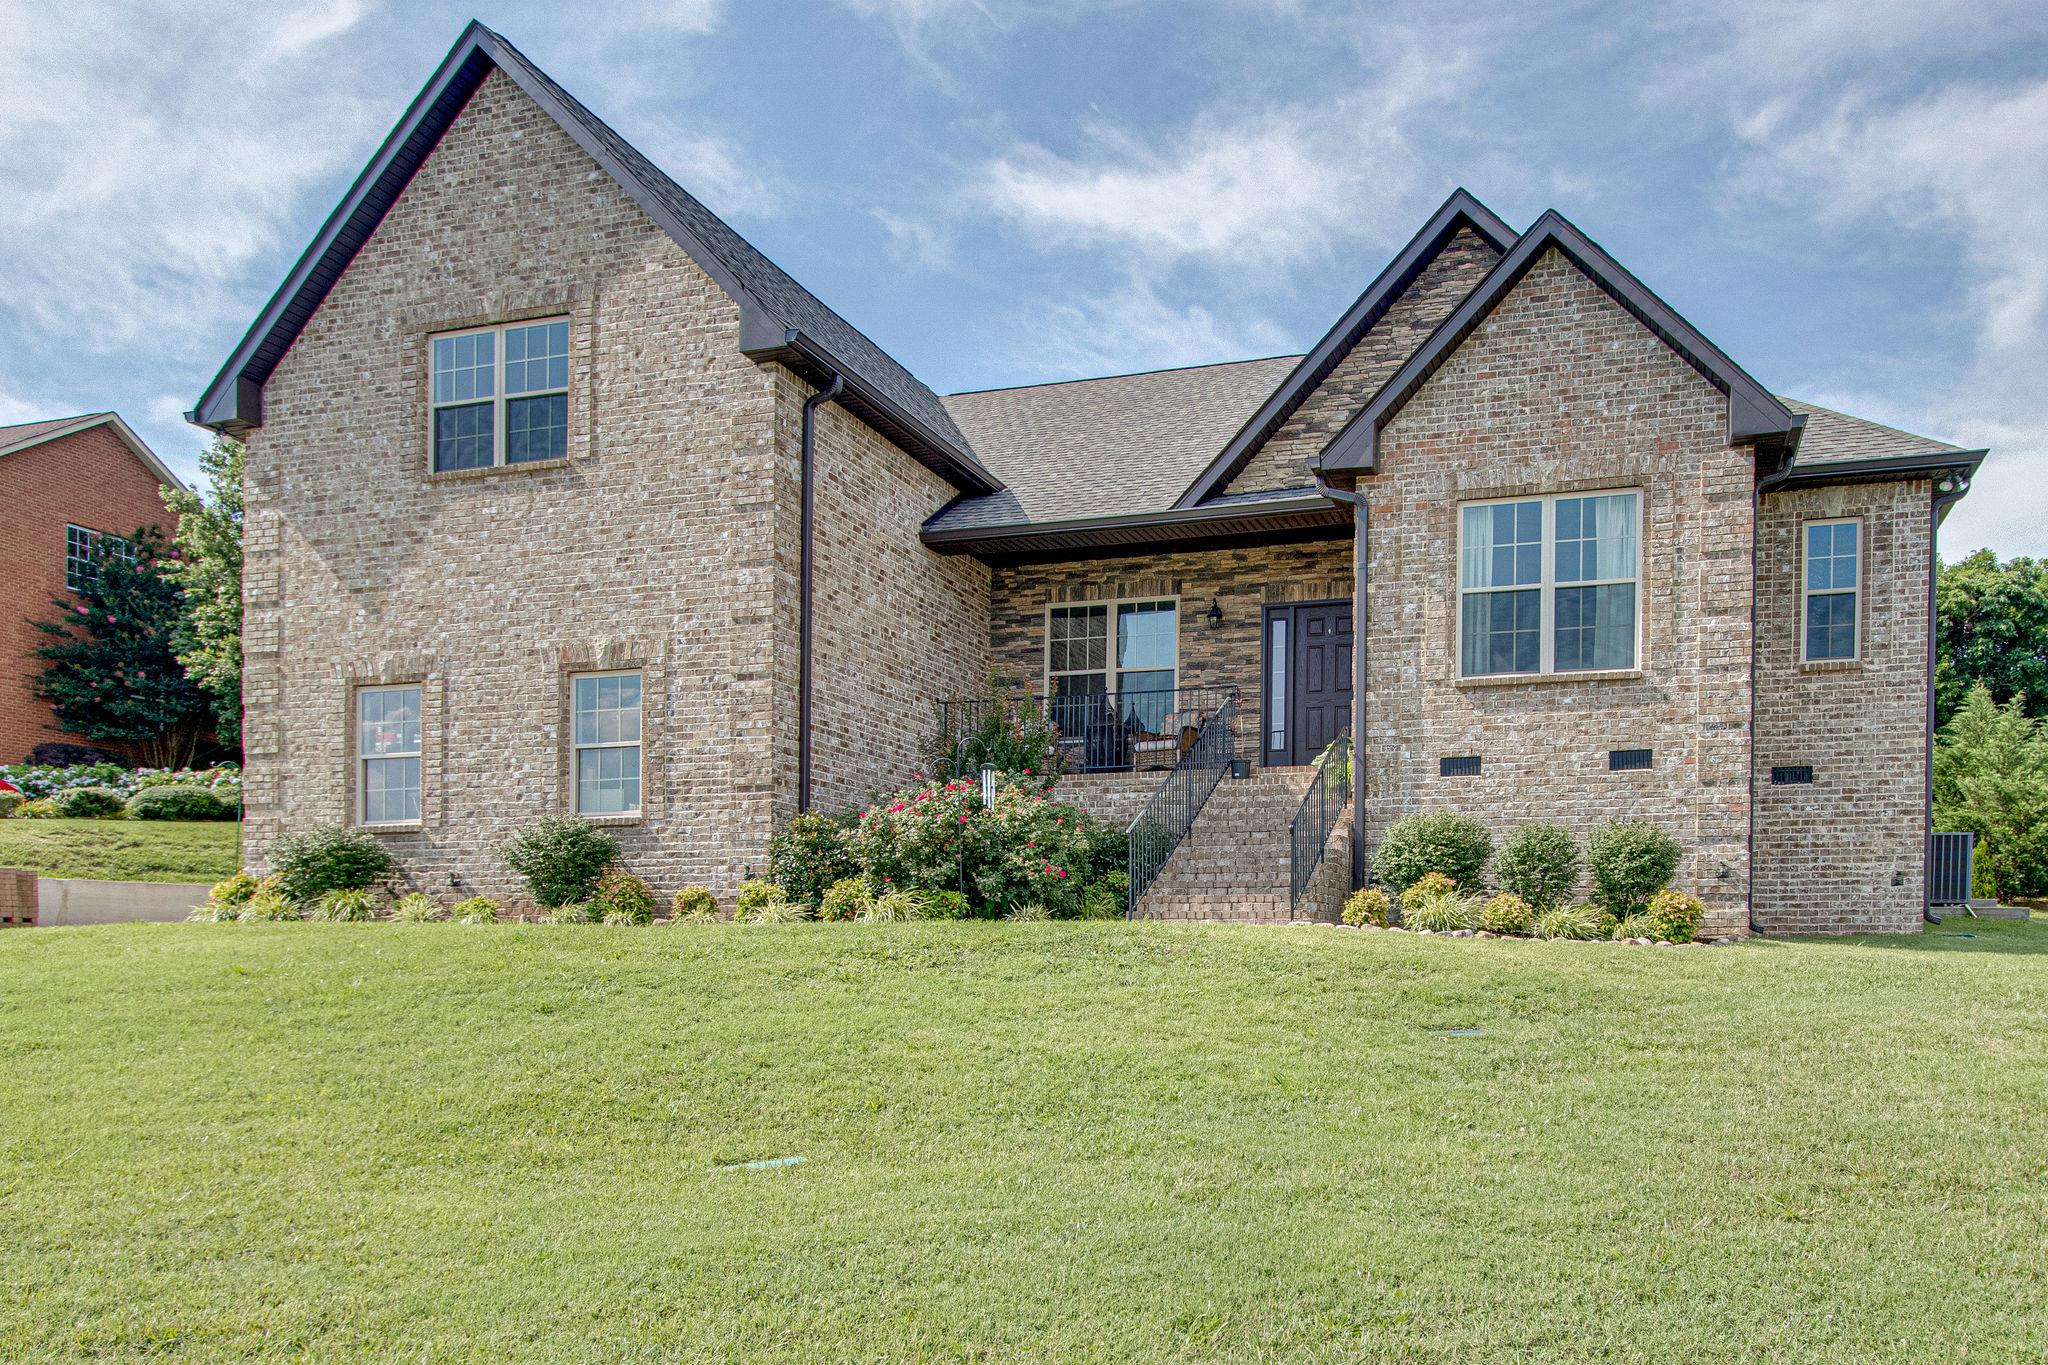 117 Chalford Pl, Lebanon, TN 37087 - Lebanon, TN real estate listing